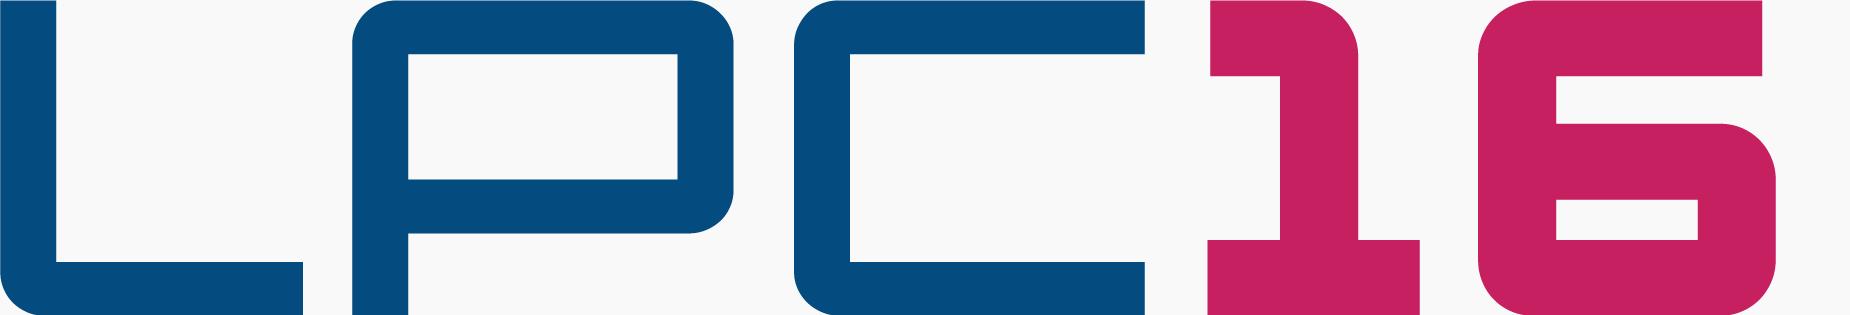 LPC16_logo